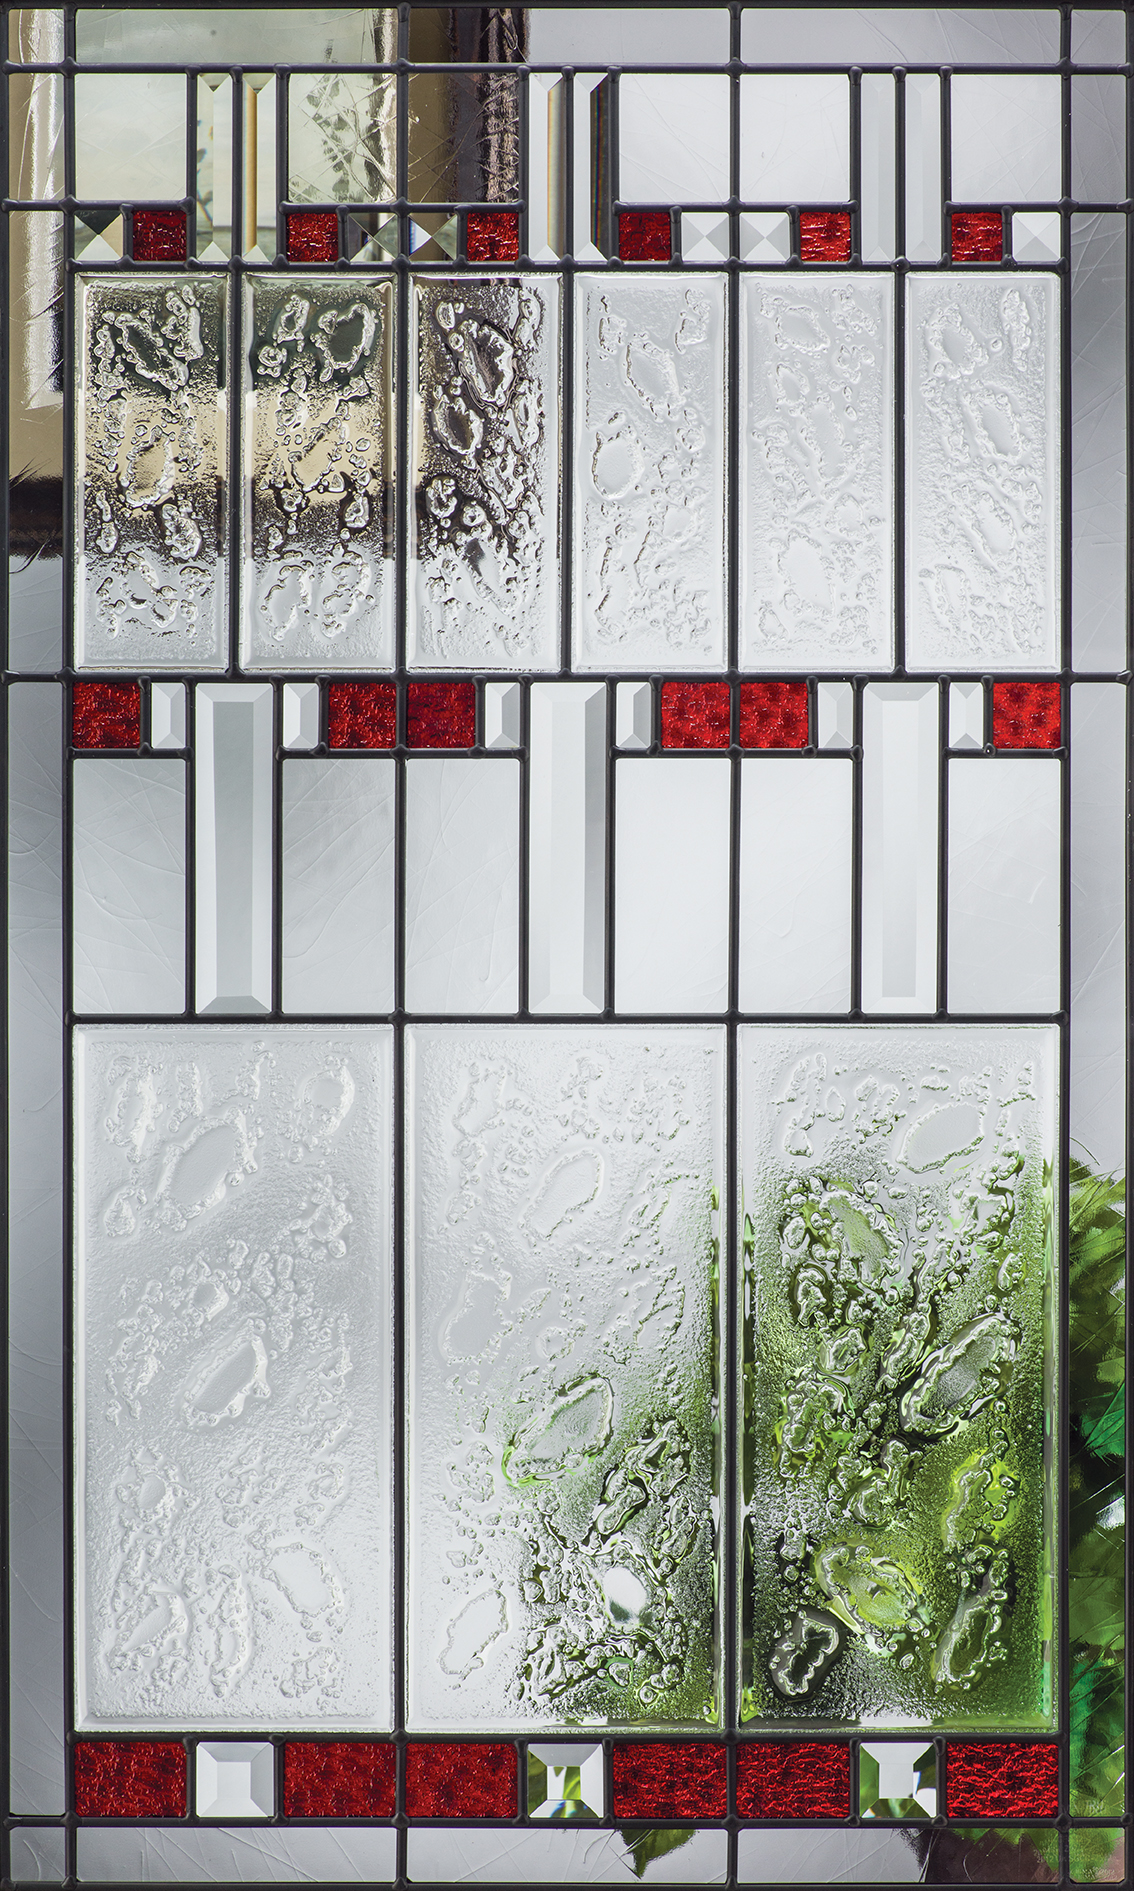 Therma-Tru Sedona Art 20 or 22 x 36 Glass and Frame